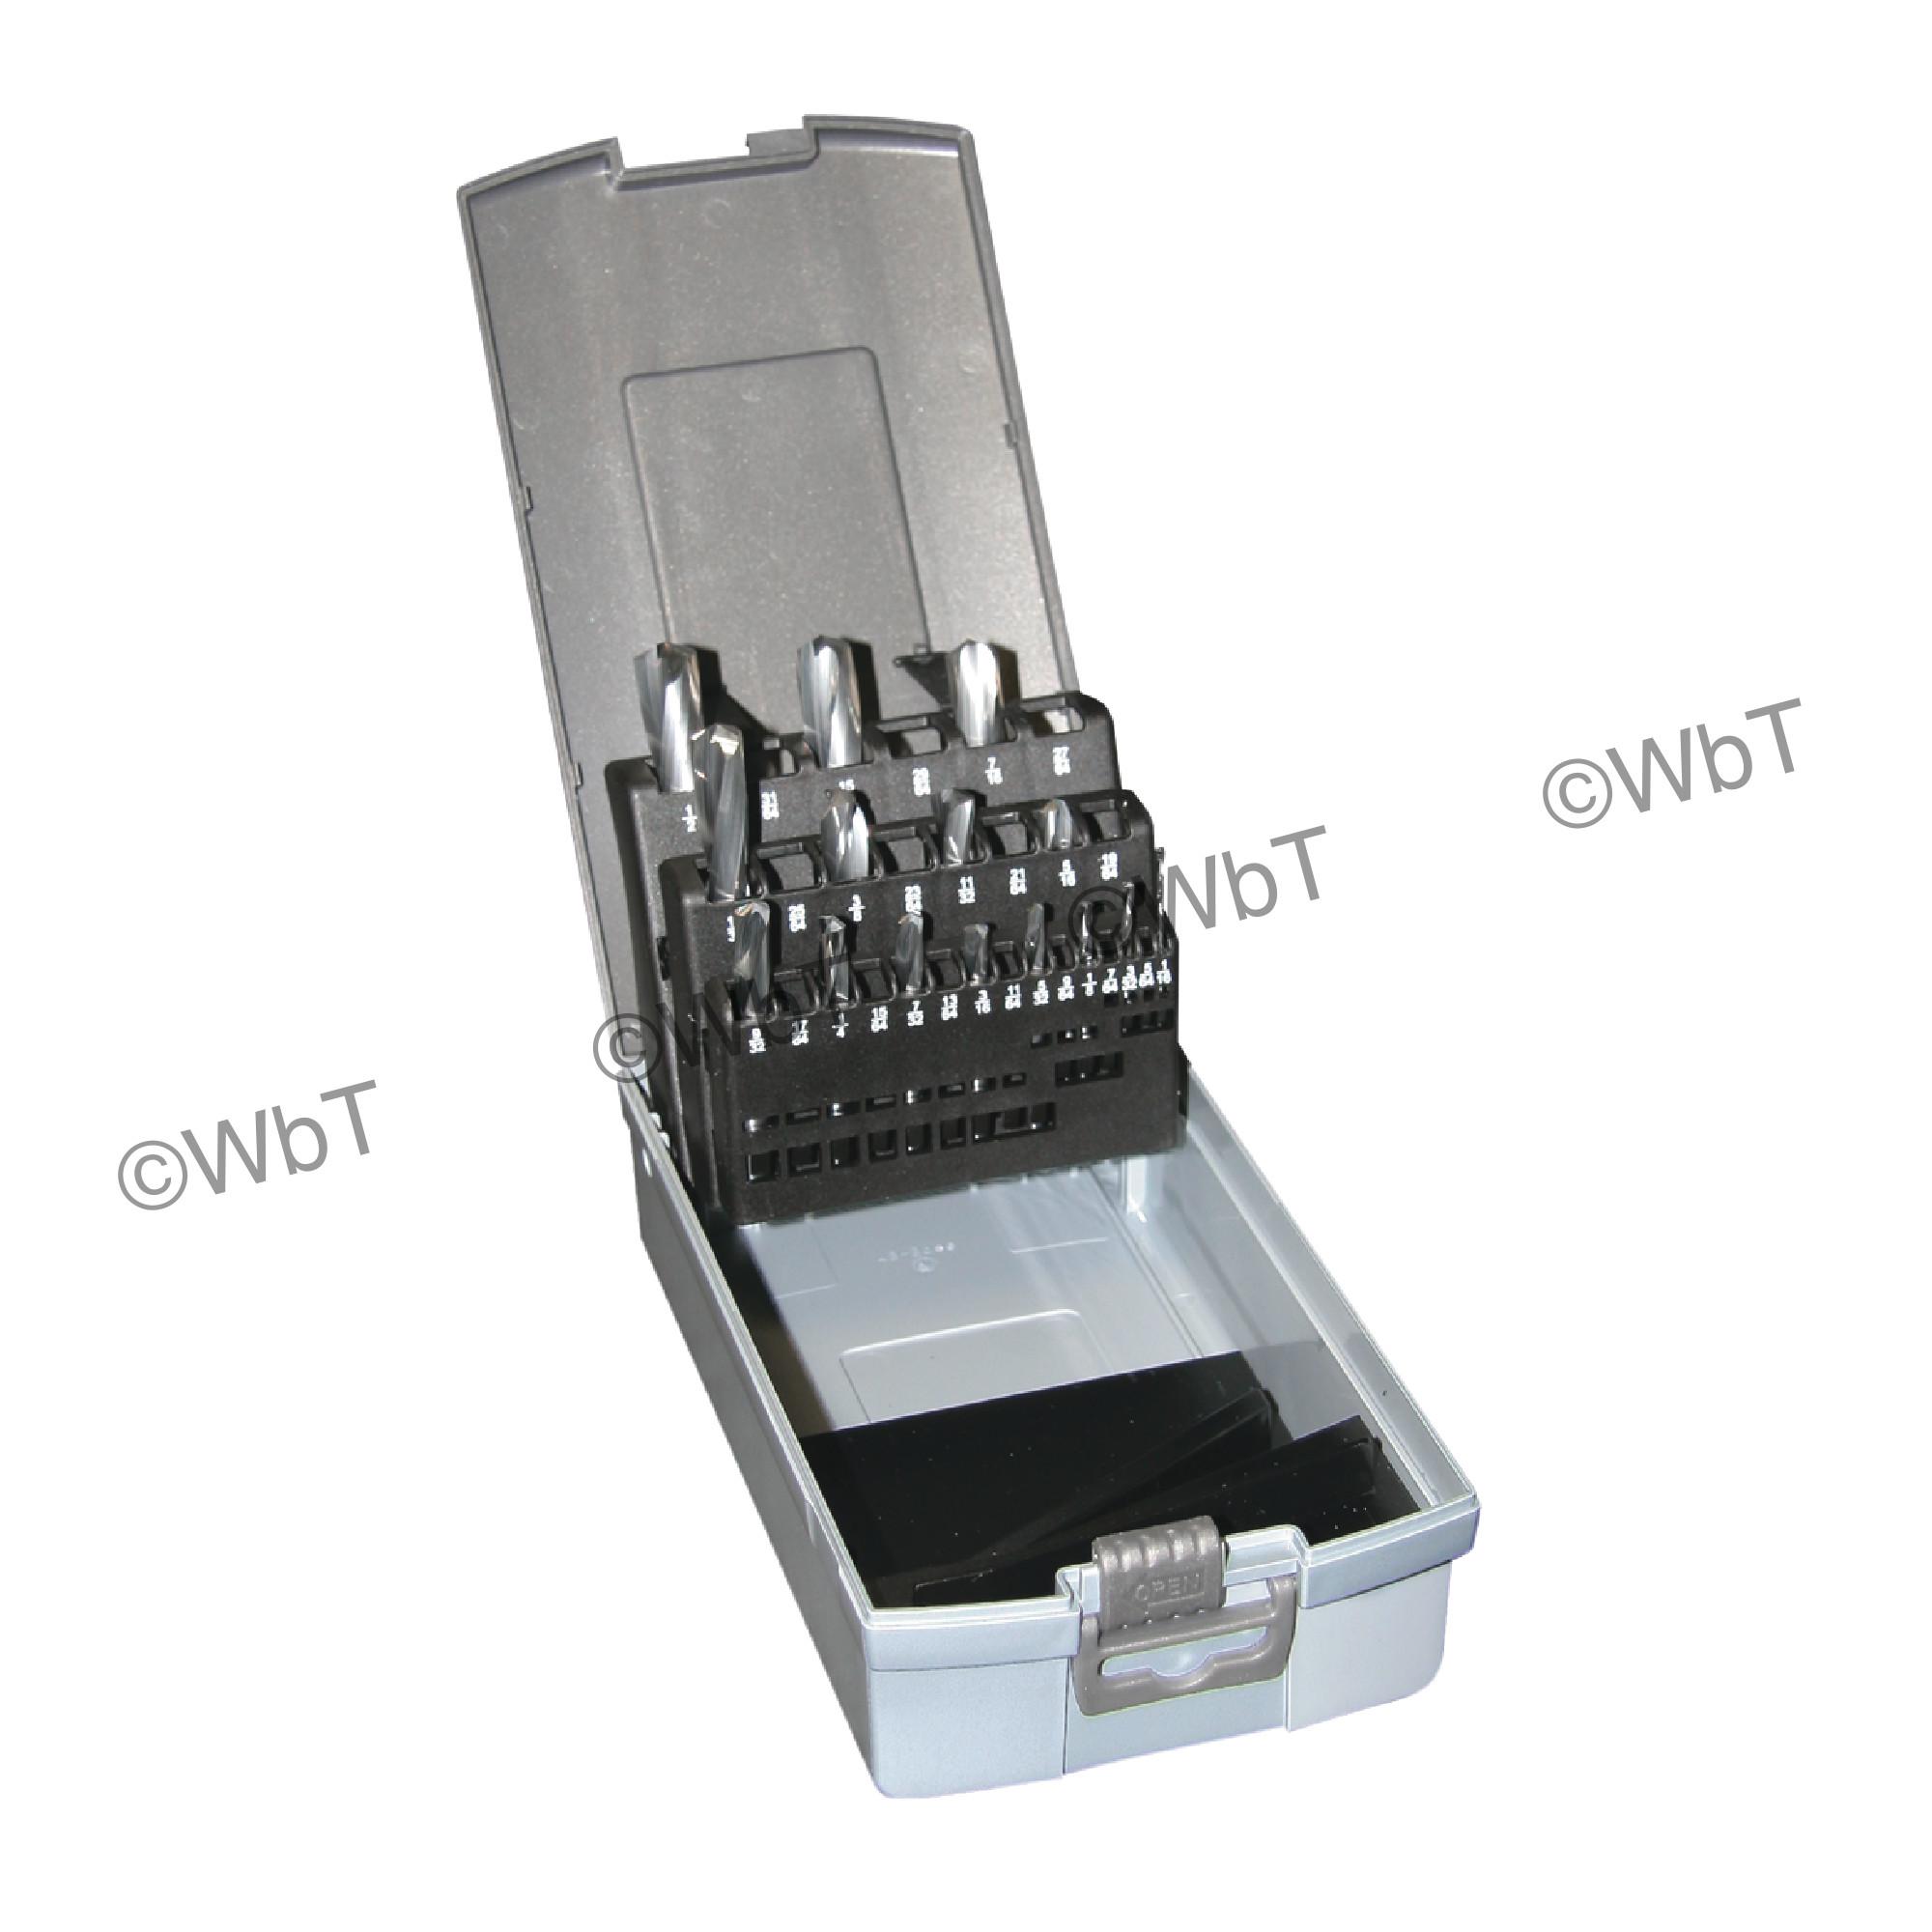 15 Piece Solid Carbide Screw Machine Length 118 degree Bright Finish Drill Set